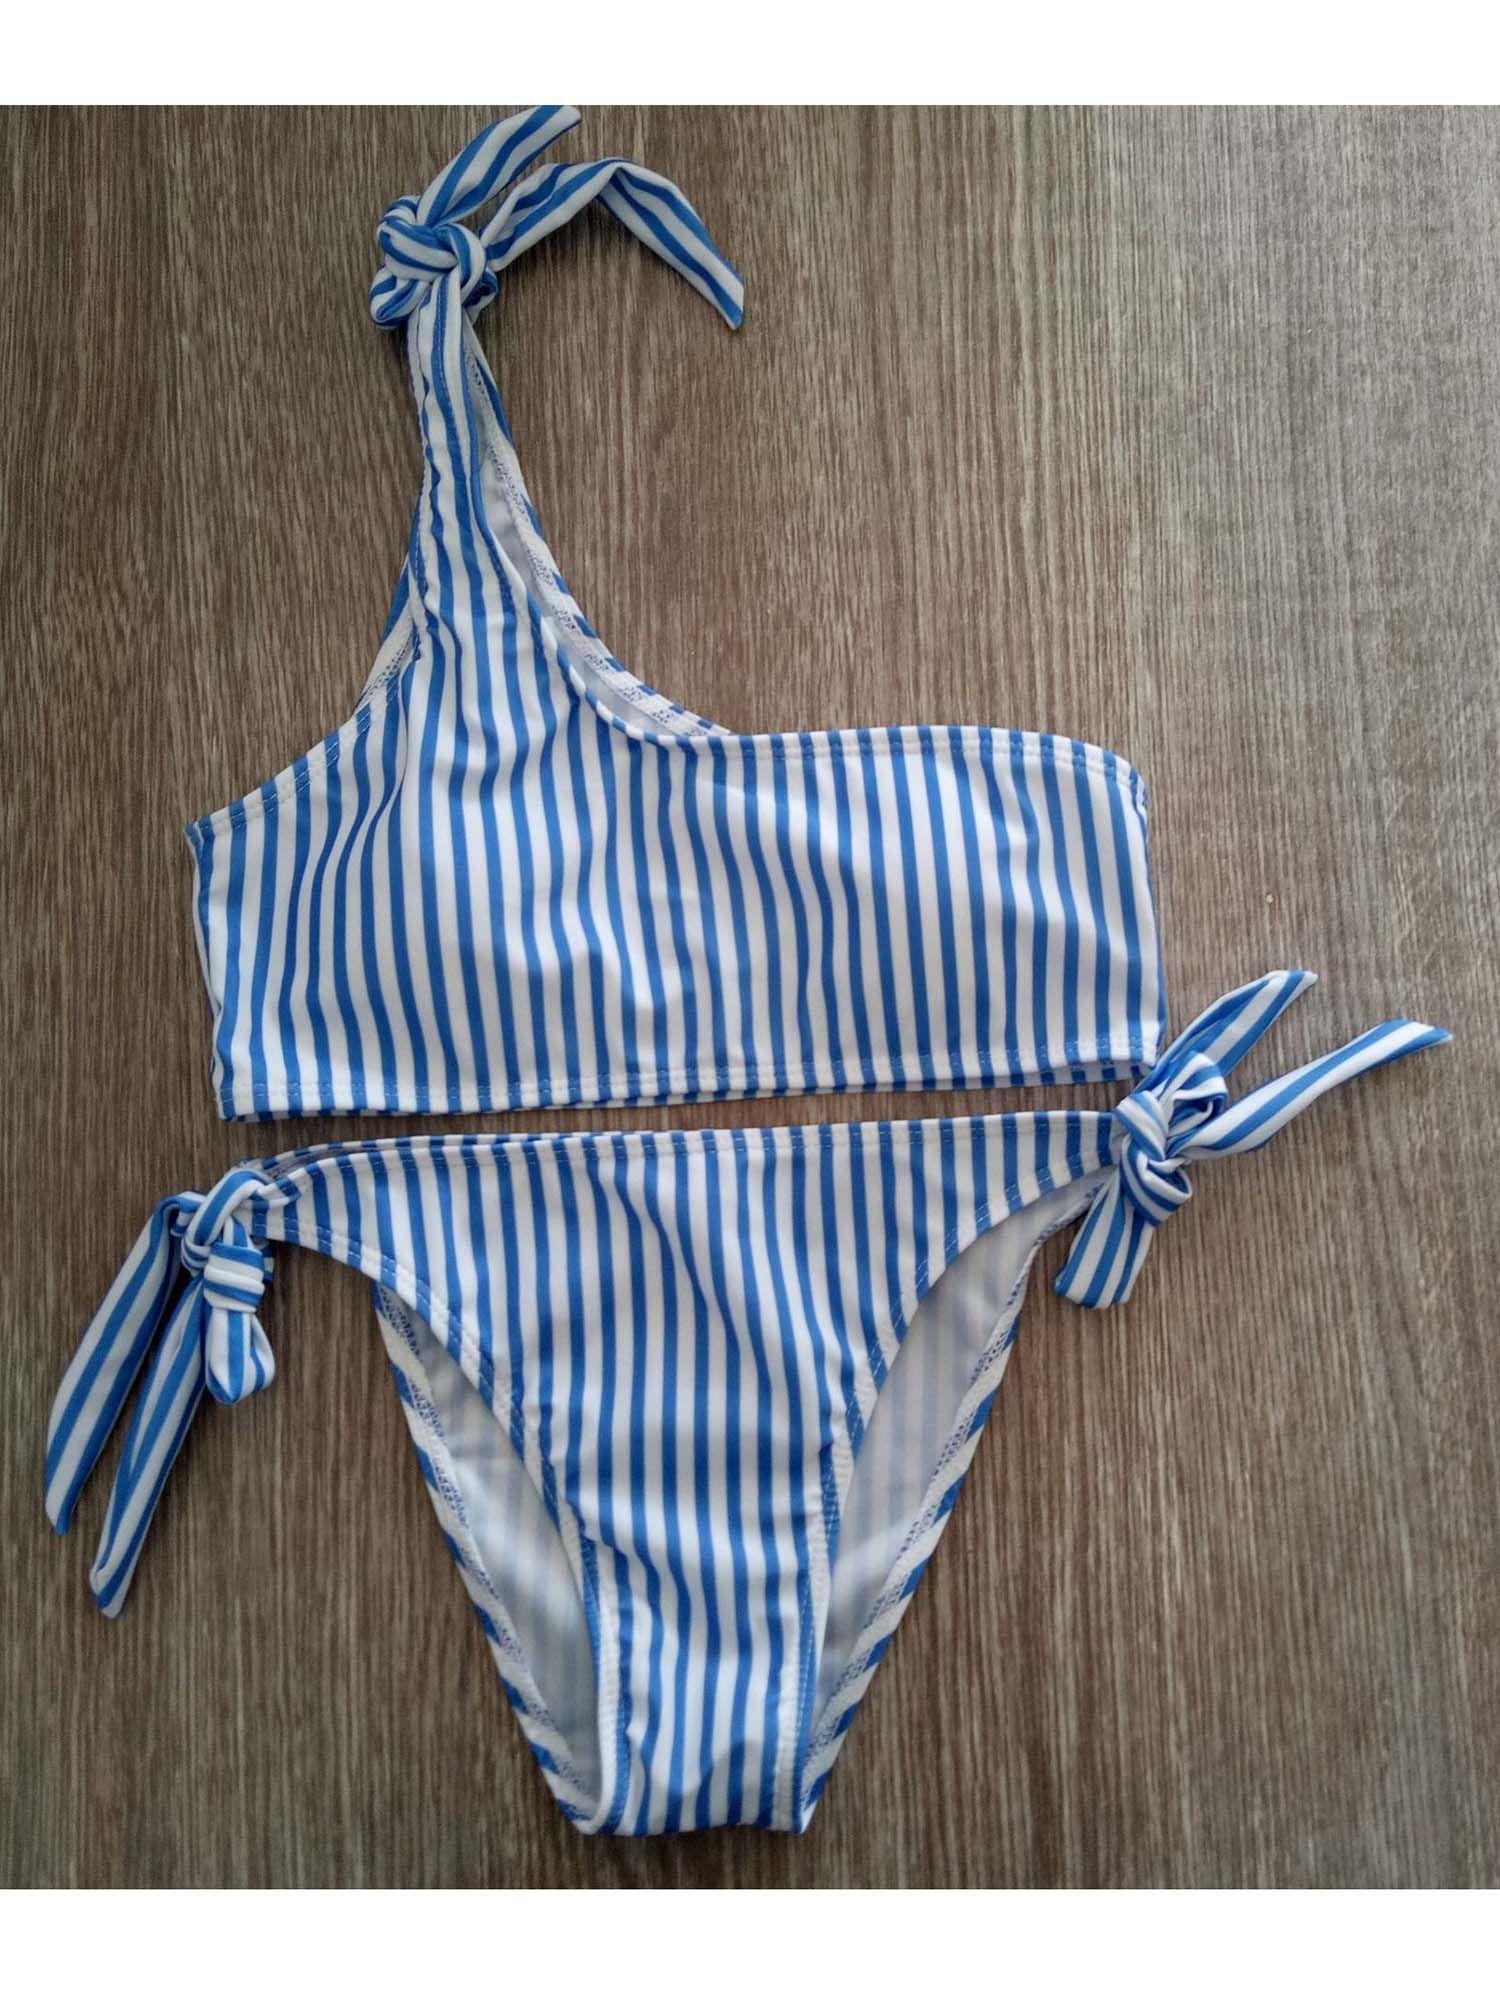 f57821d2c0259 Phoebe Cat Womens Swimwear Bikini Set for Summer Beach, Summer Two Piece  Bandage Push-